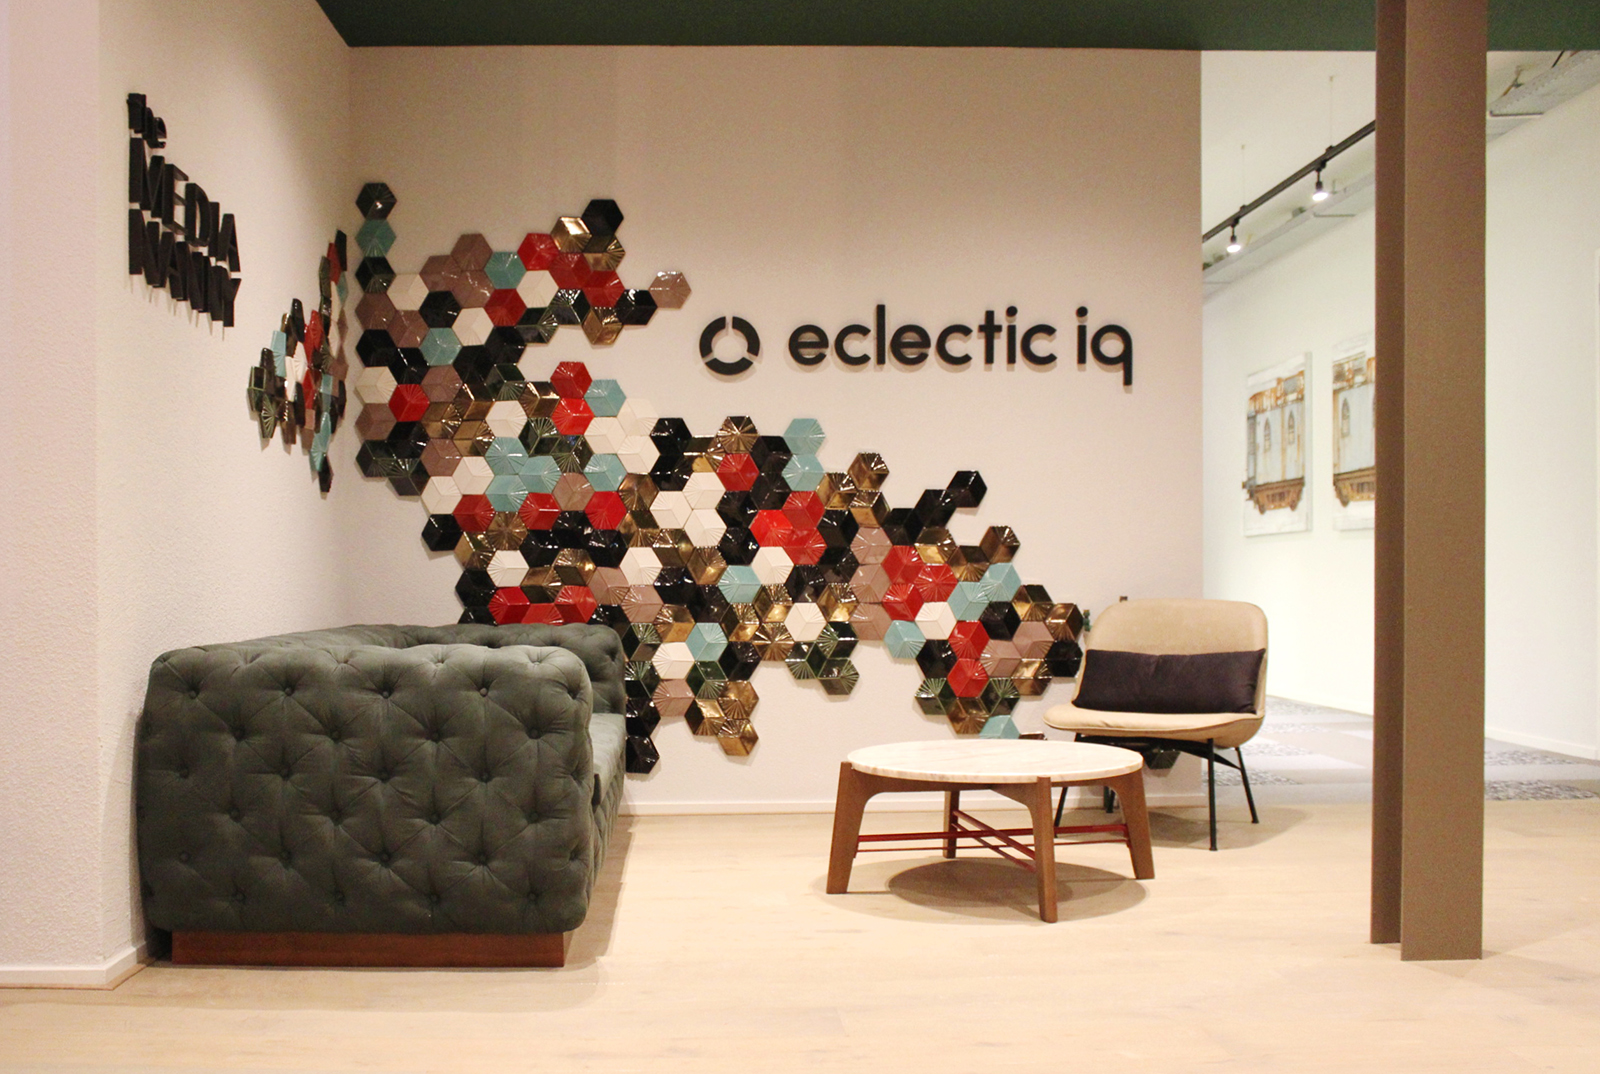 eclectiq-office-1